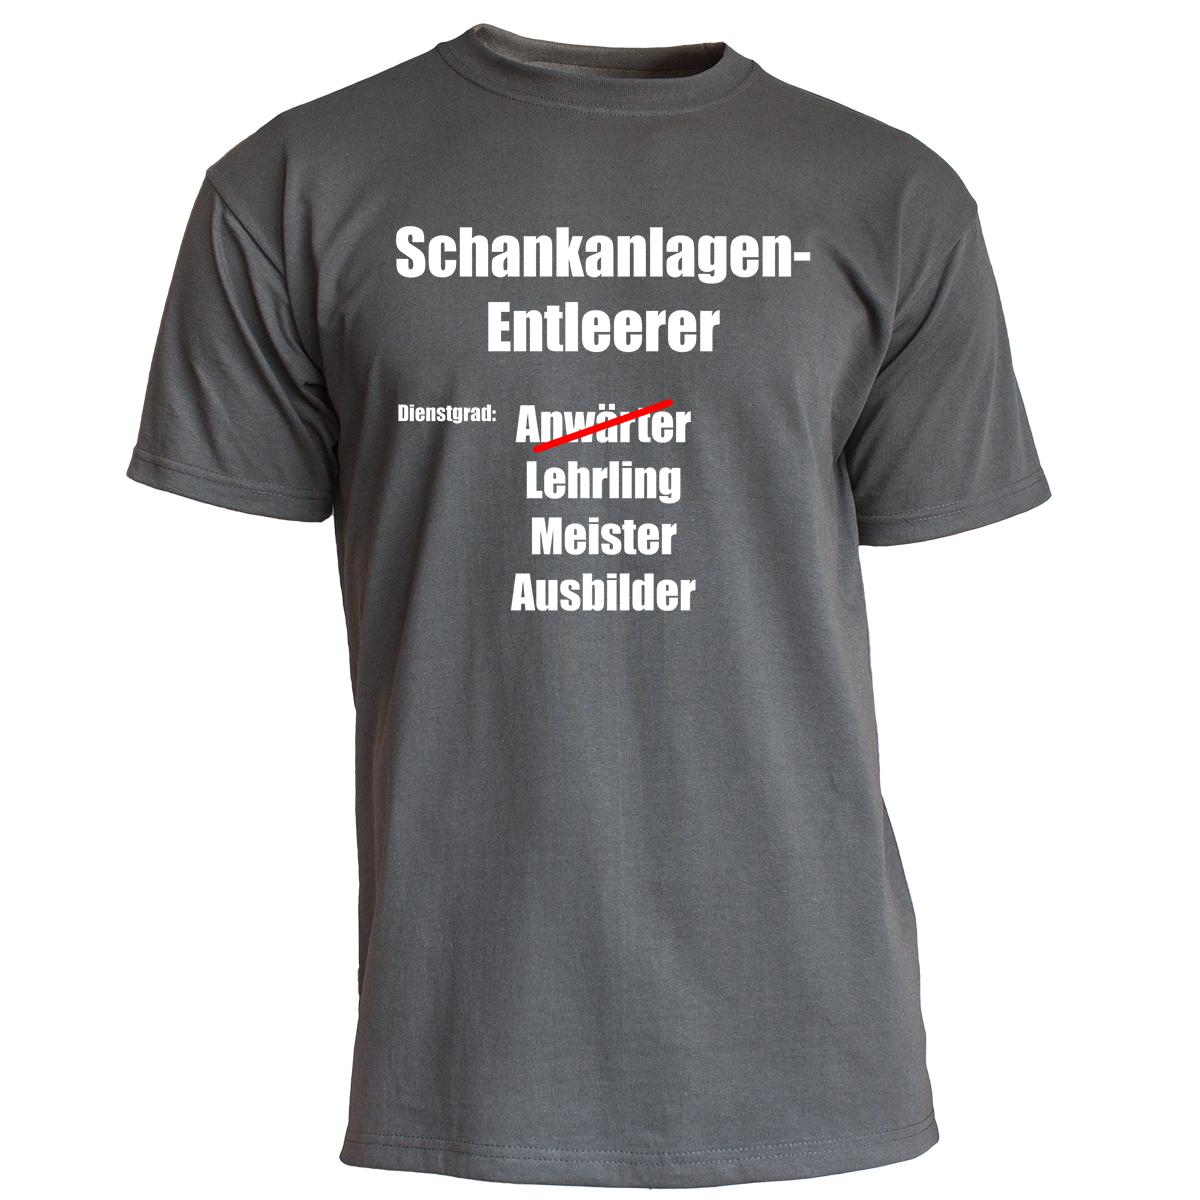 Nukular-T-Shirt-Motiv-034-Schankanlagen-Entleerer-034-lustig-Saufen-Fun-Party-Bier